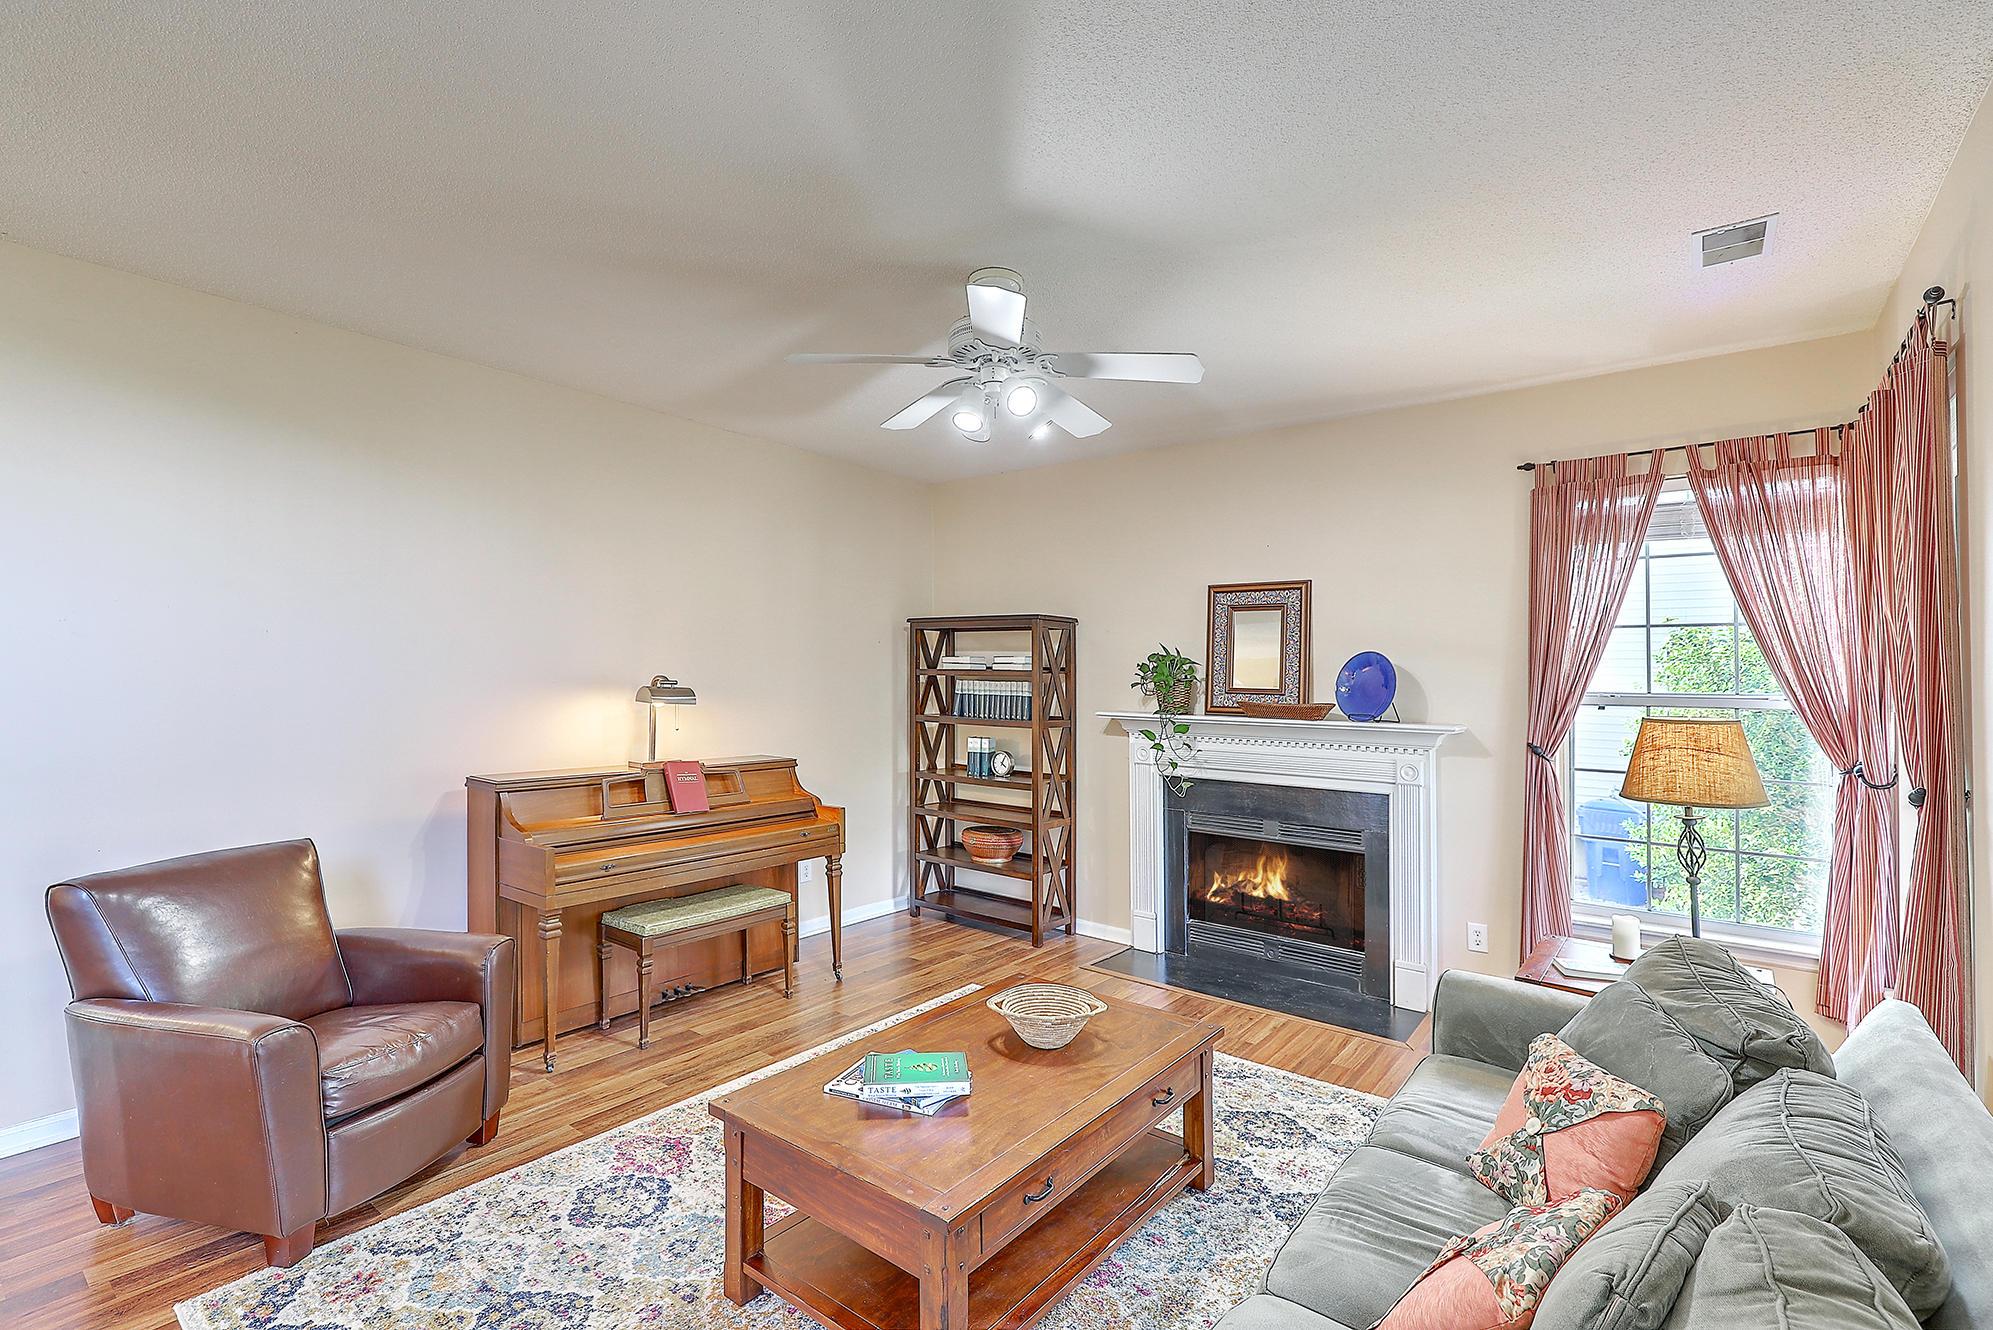 Belle Hall Homes For Sale - 106 Revolution, Mount Pleasant, SC - 36